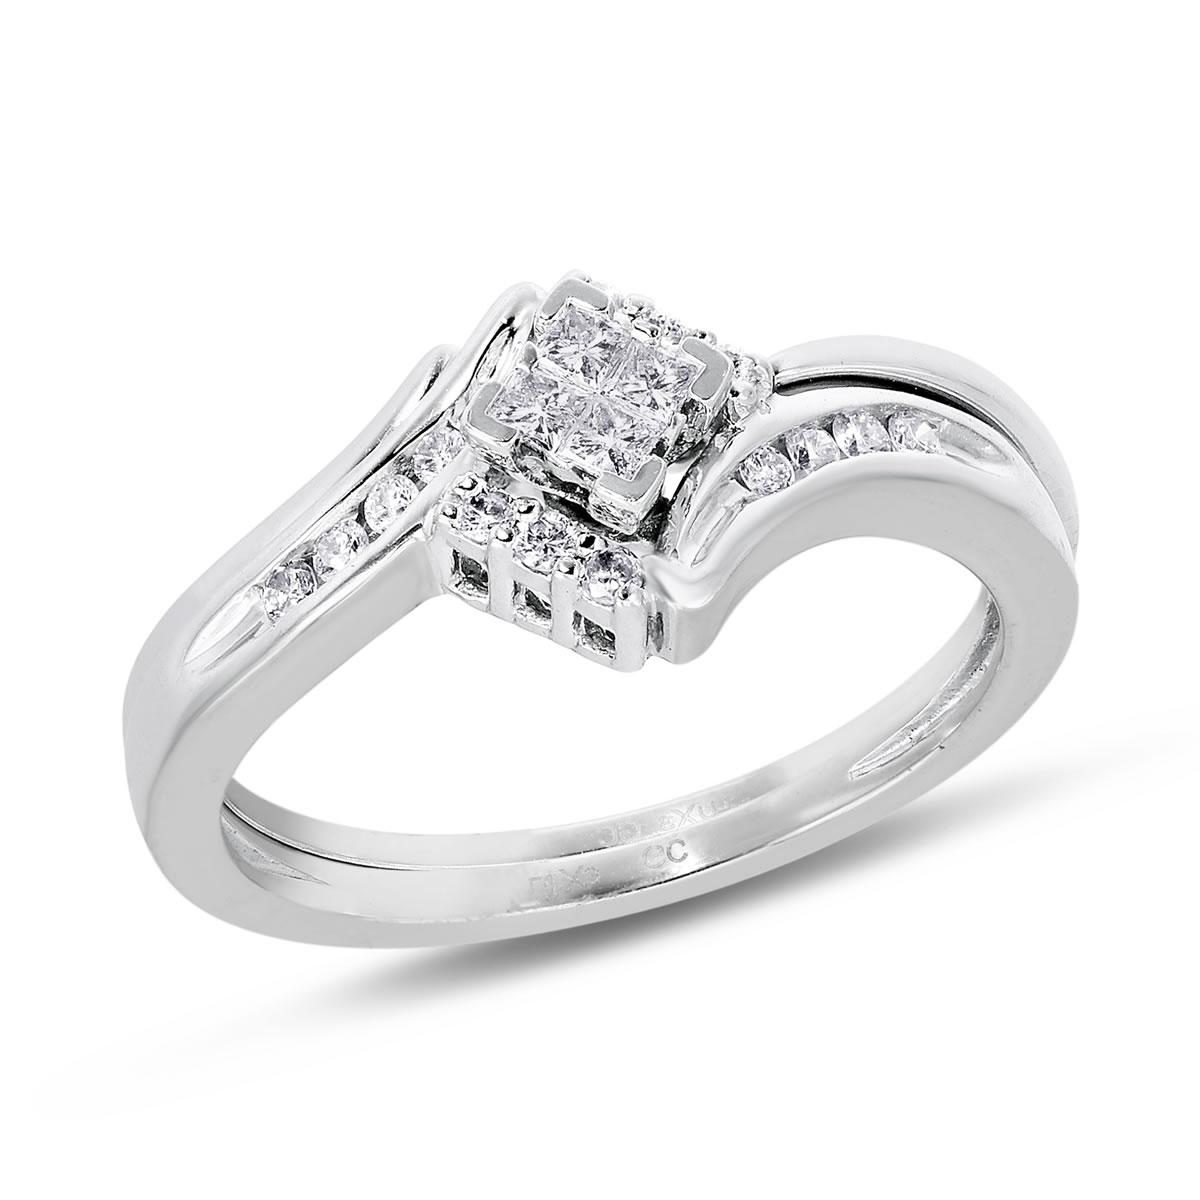 Lux-3 I2 Diamond Bridal Set, 1/4 ctw